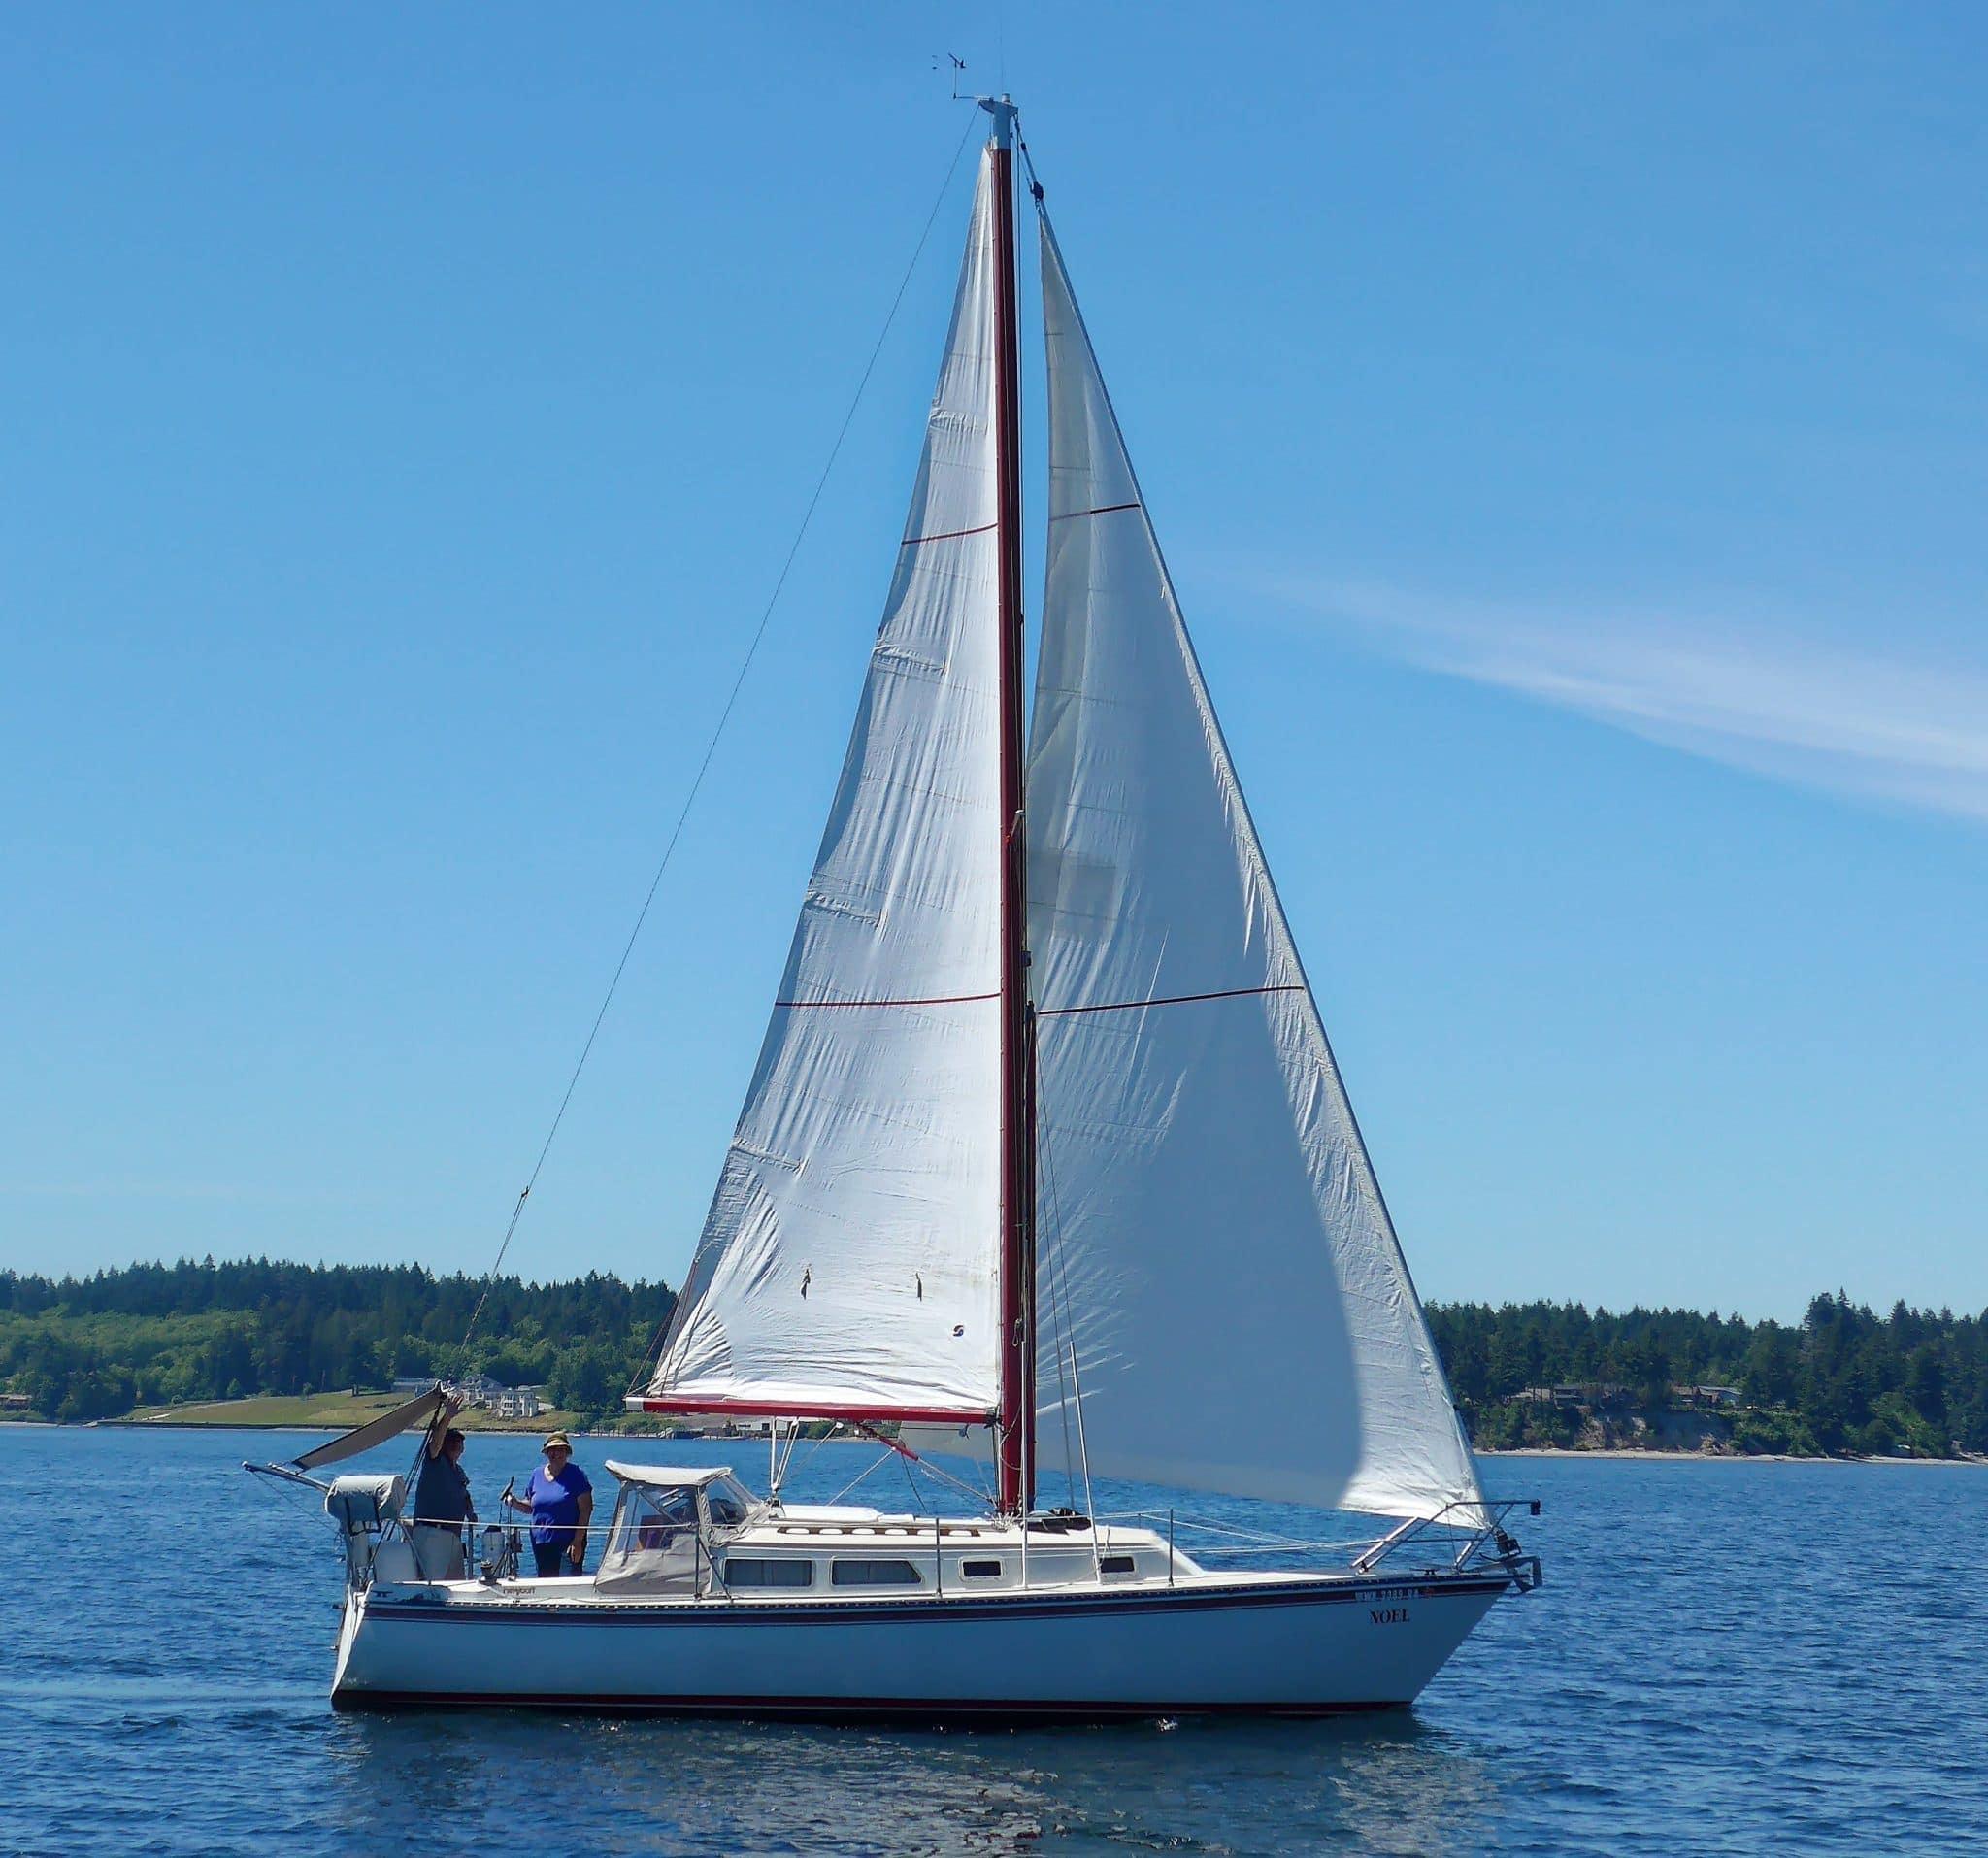 Noel under sail